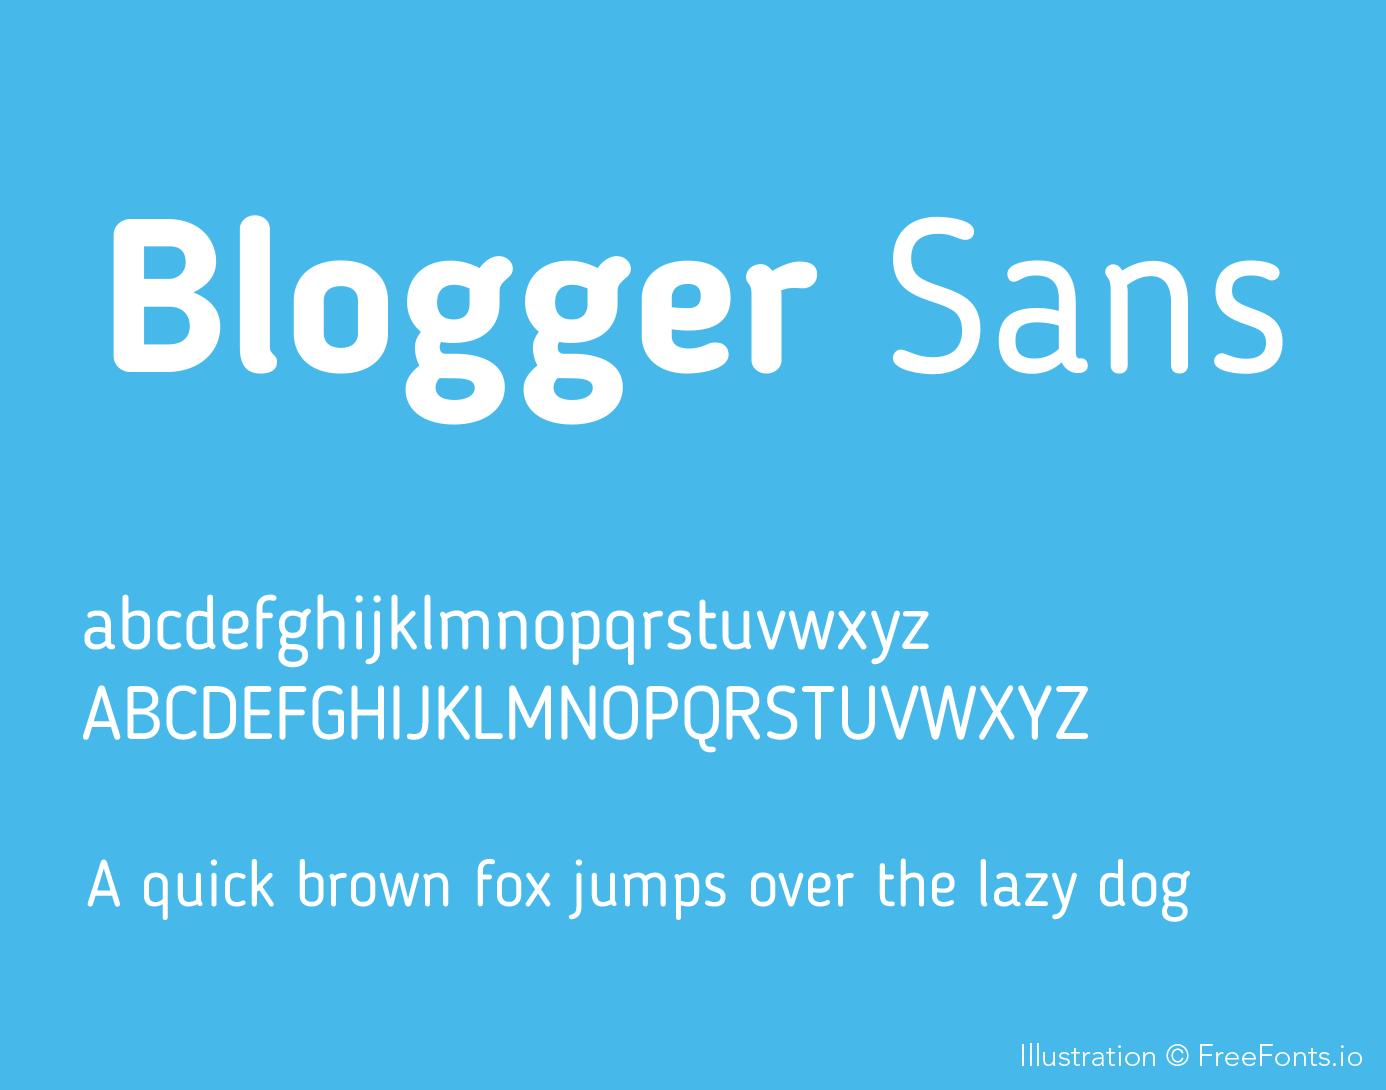 https://fontclarity.com/wp-content/uploads/2019/09/blogger-sans-font-download-0.png Free Download